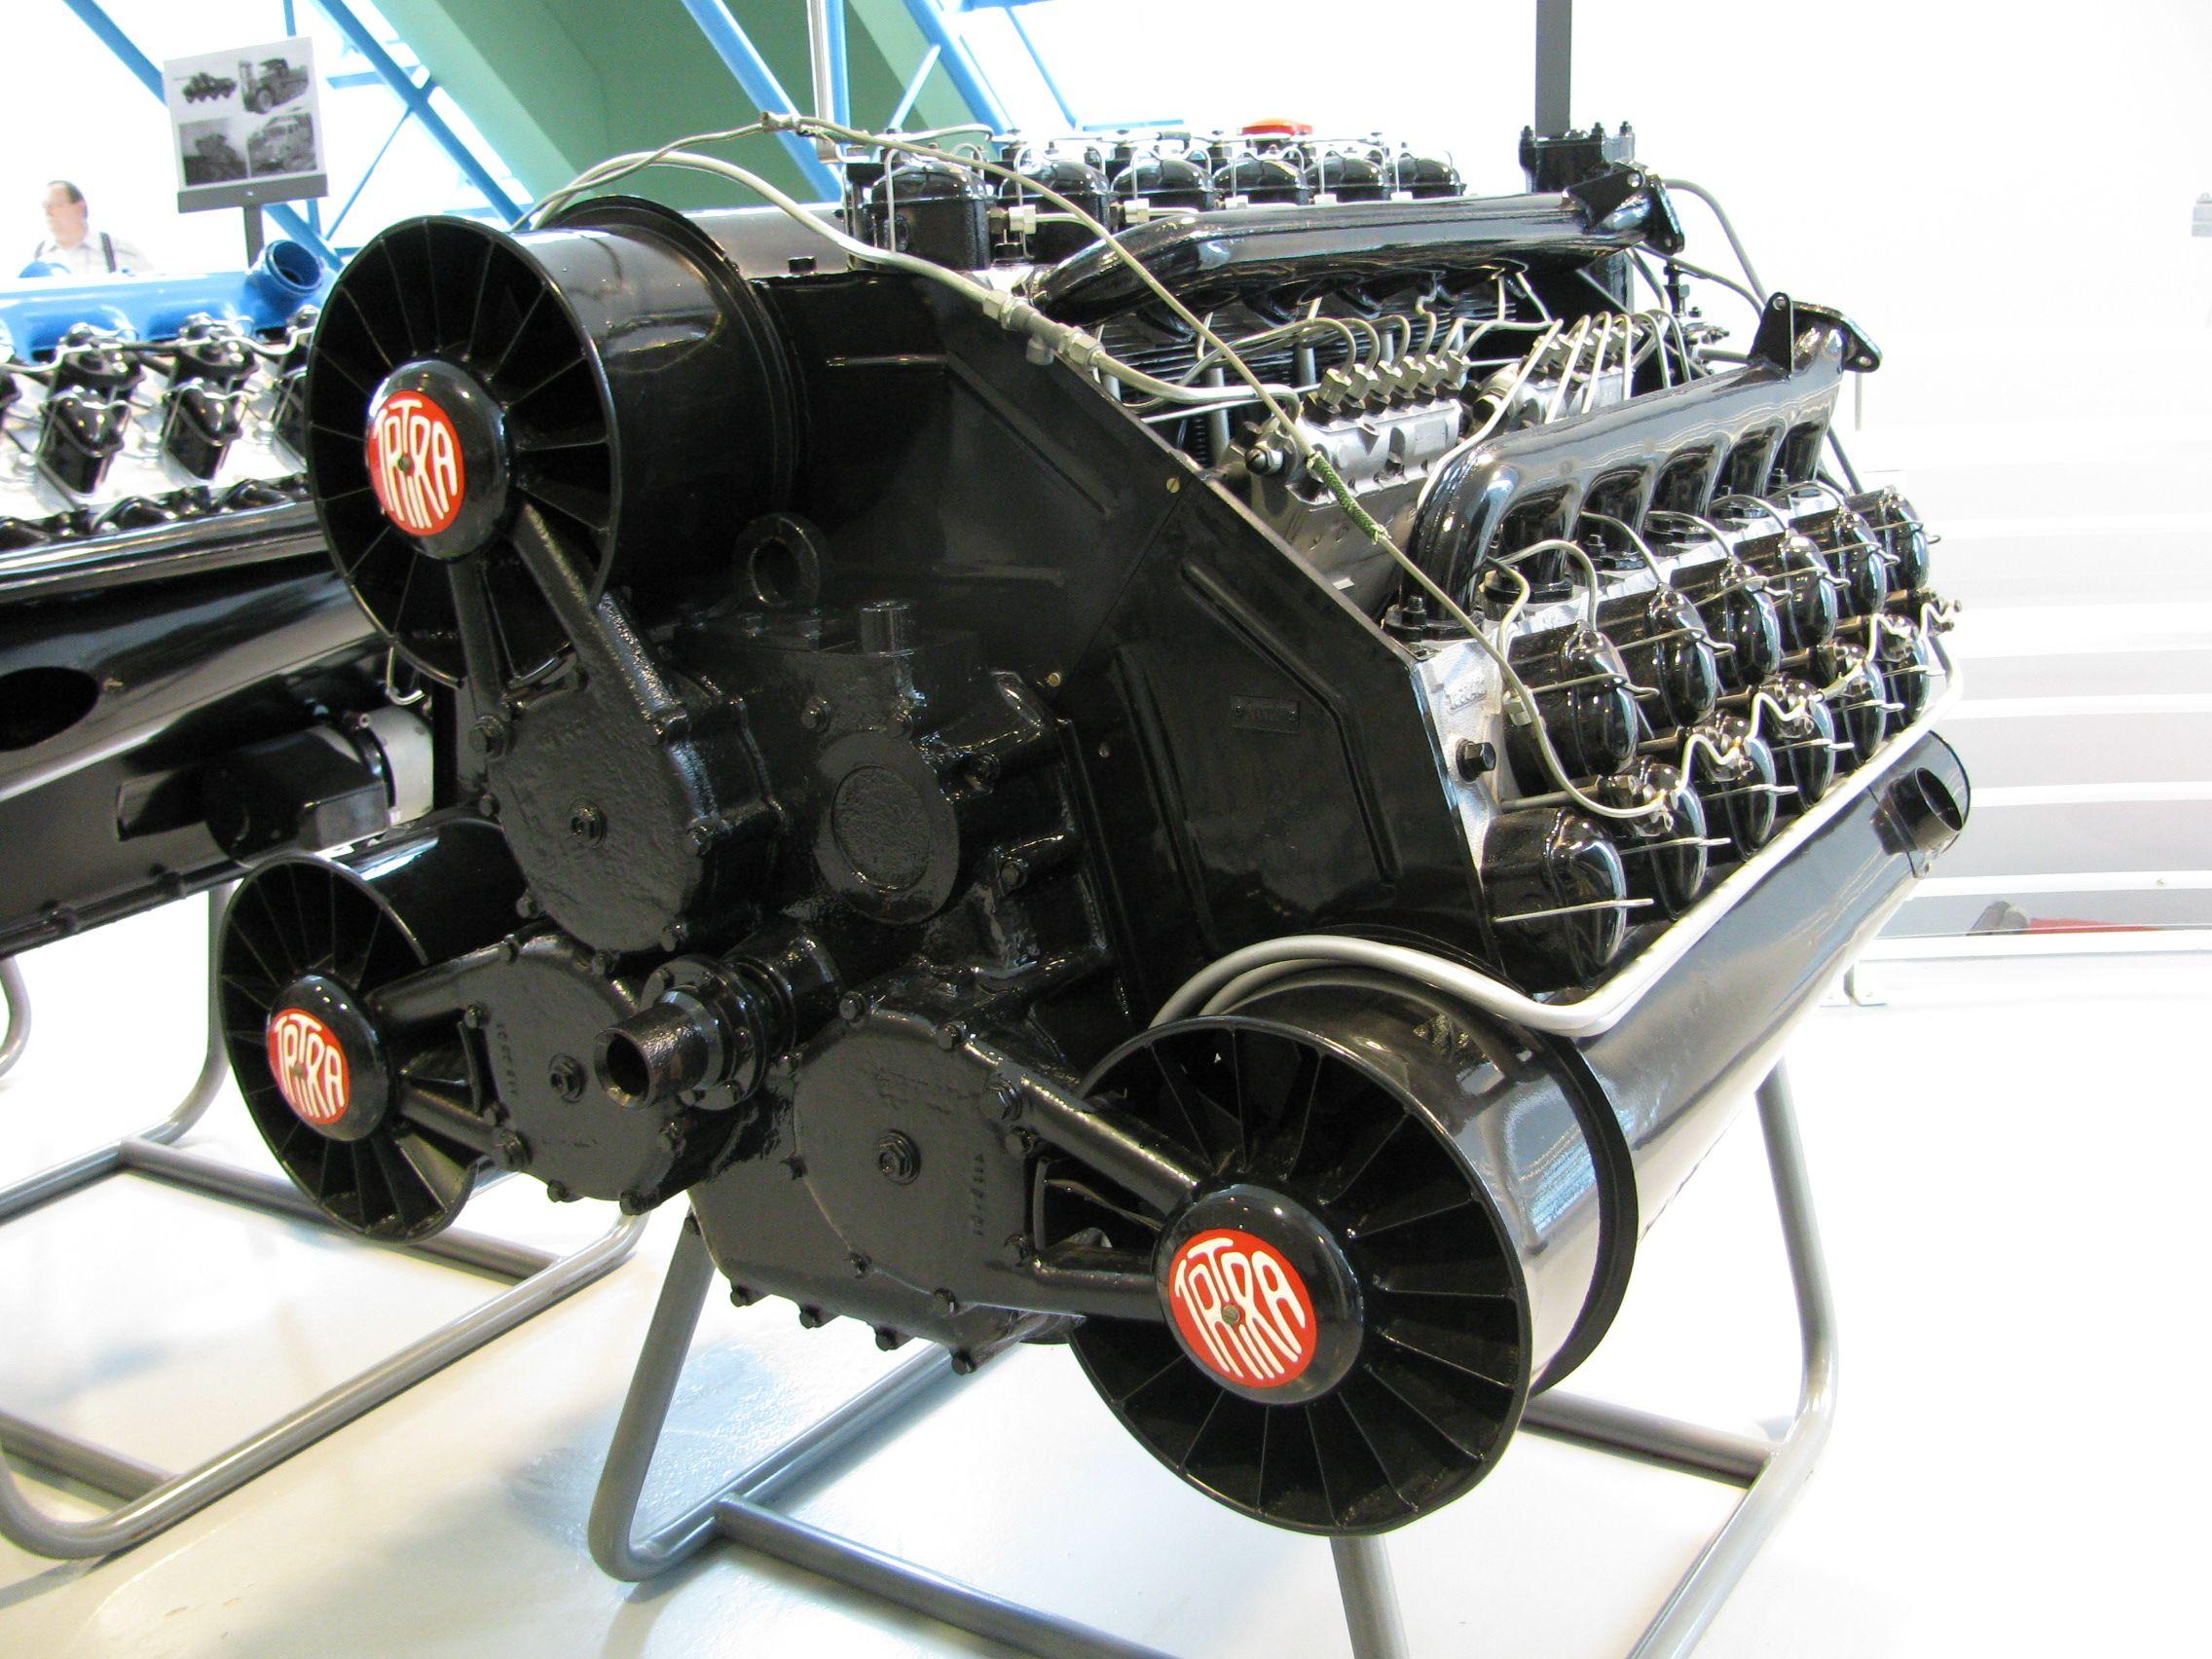 2018 bugatti chiron engine. fine bugatti rocket engine used in the saturn v program airbus rollsroyce trent 900  engine pratt u0026 whitney radial engine throughout 2018 bugatti chiron